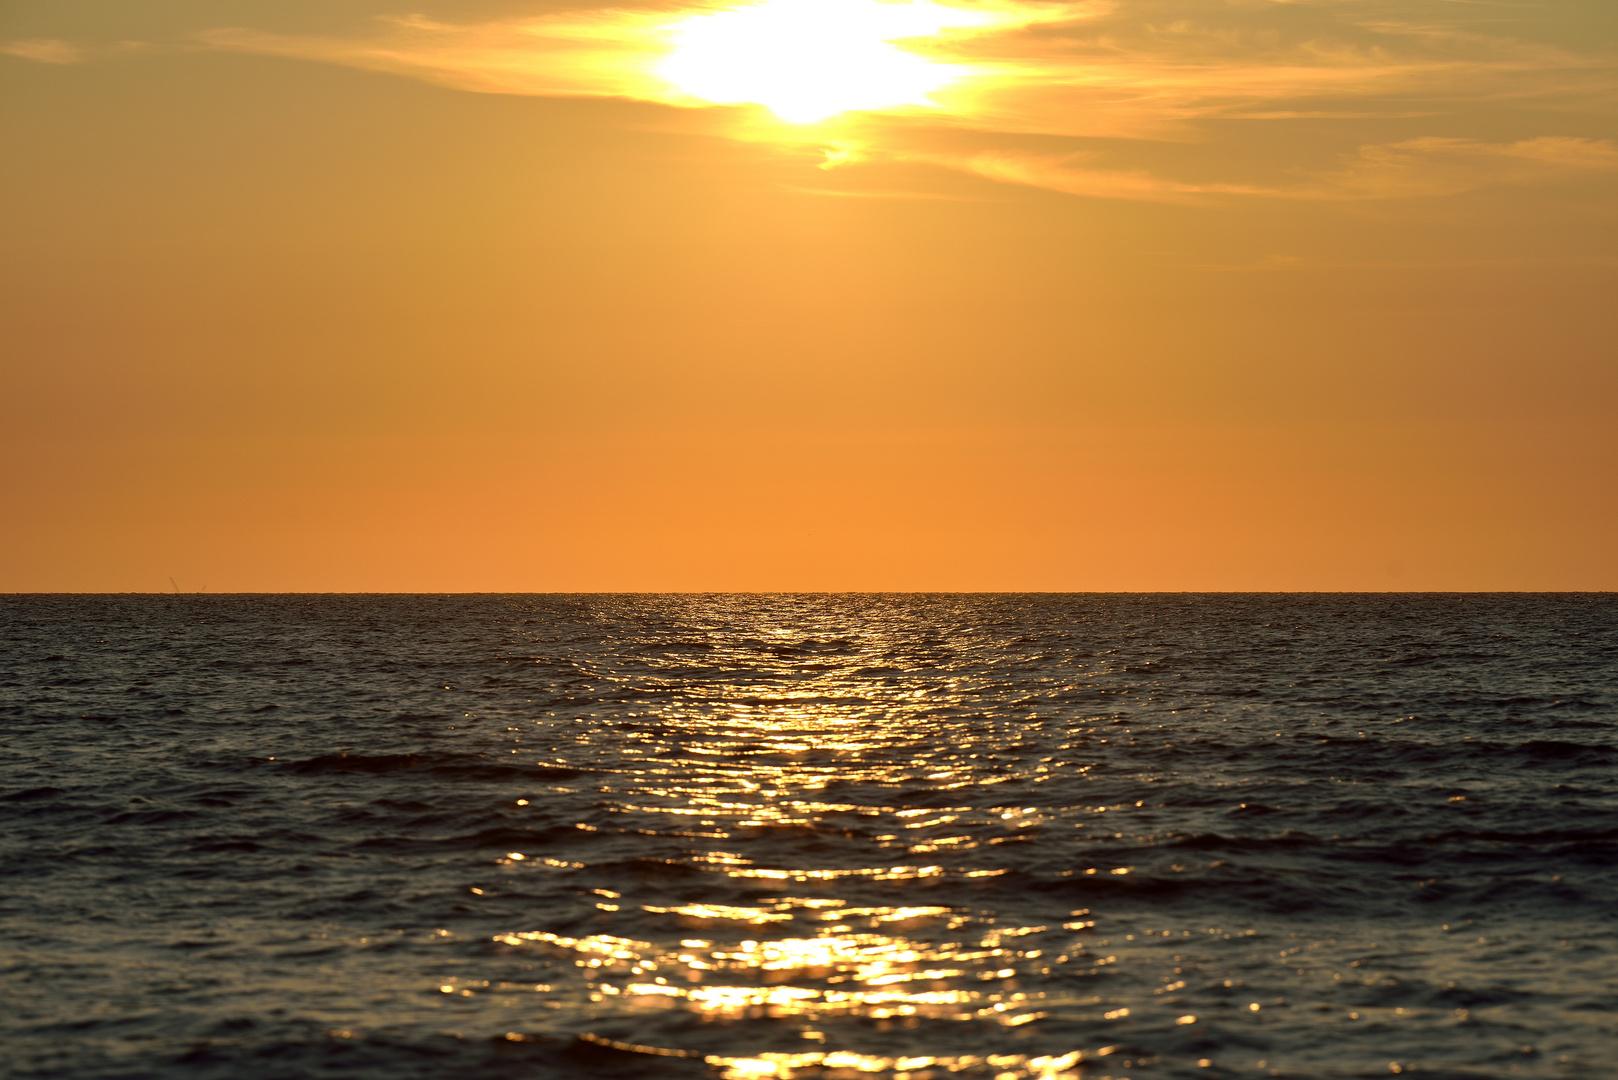 Sonnenuntergang 2 Texel - Juli 2013